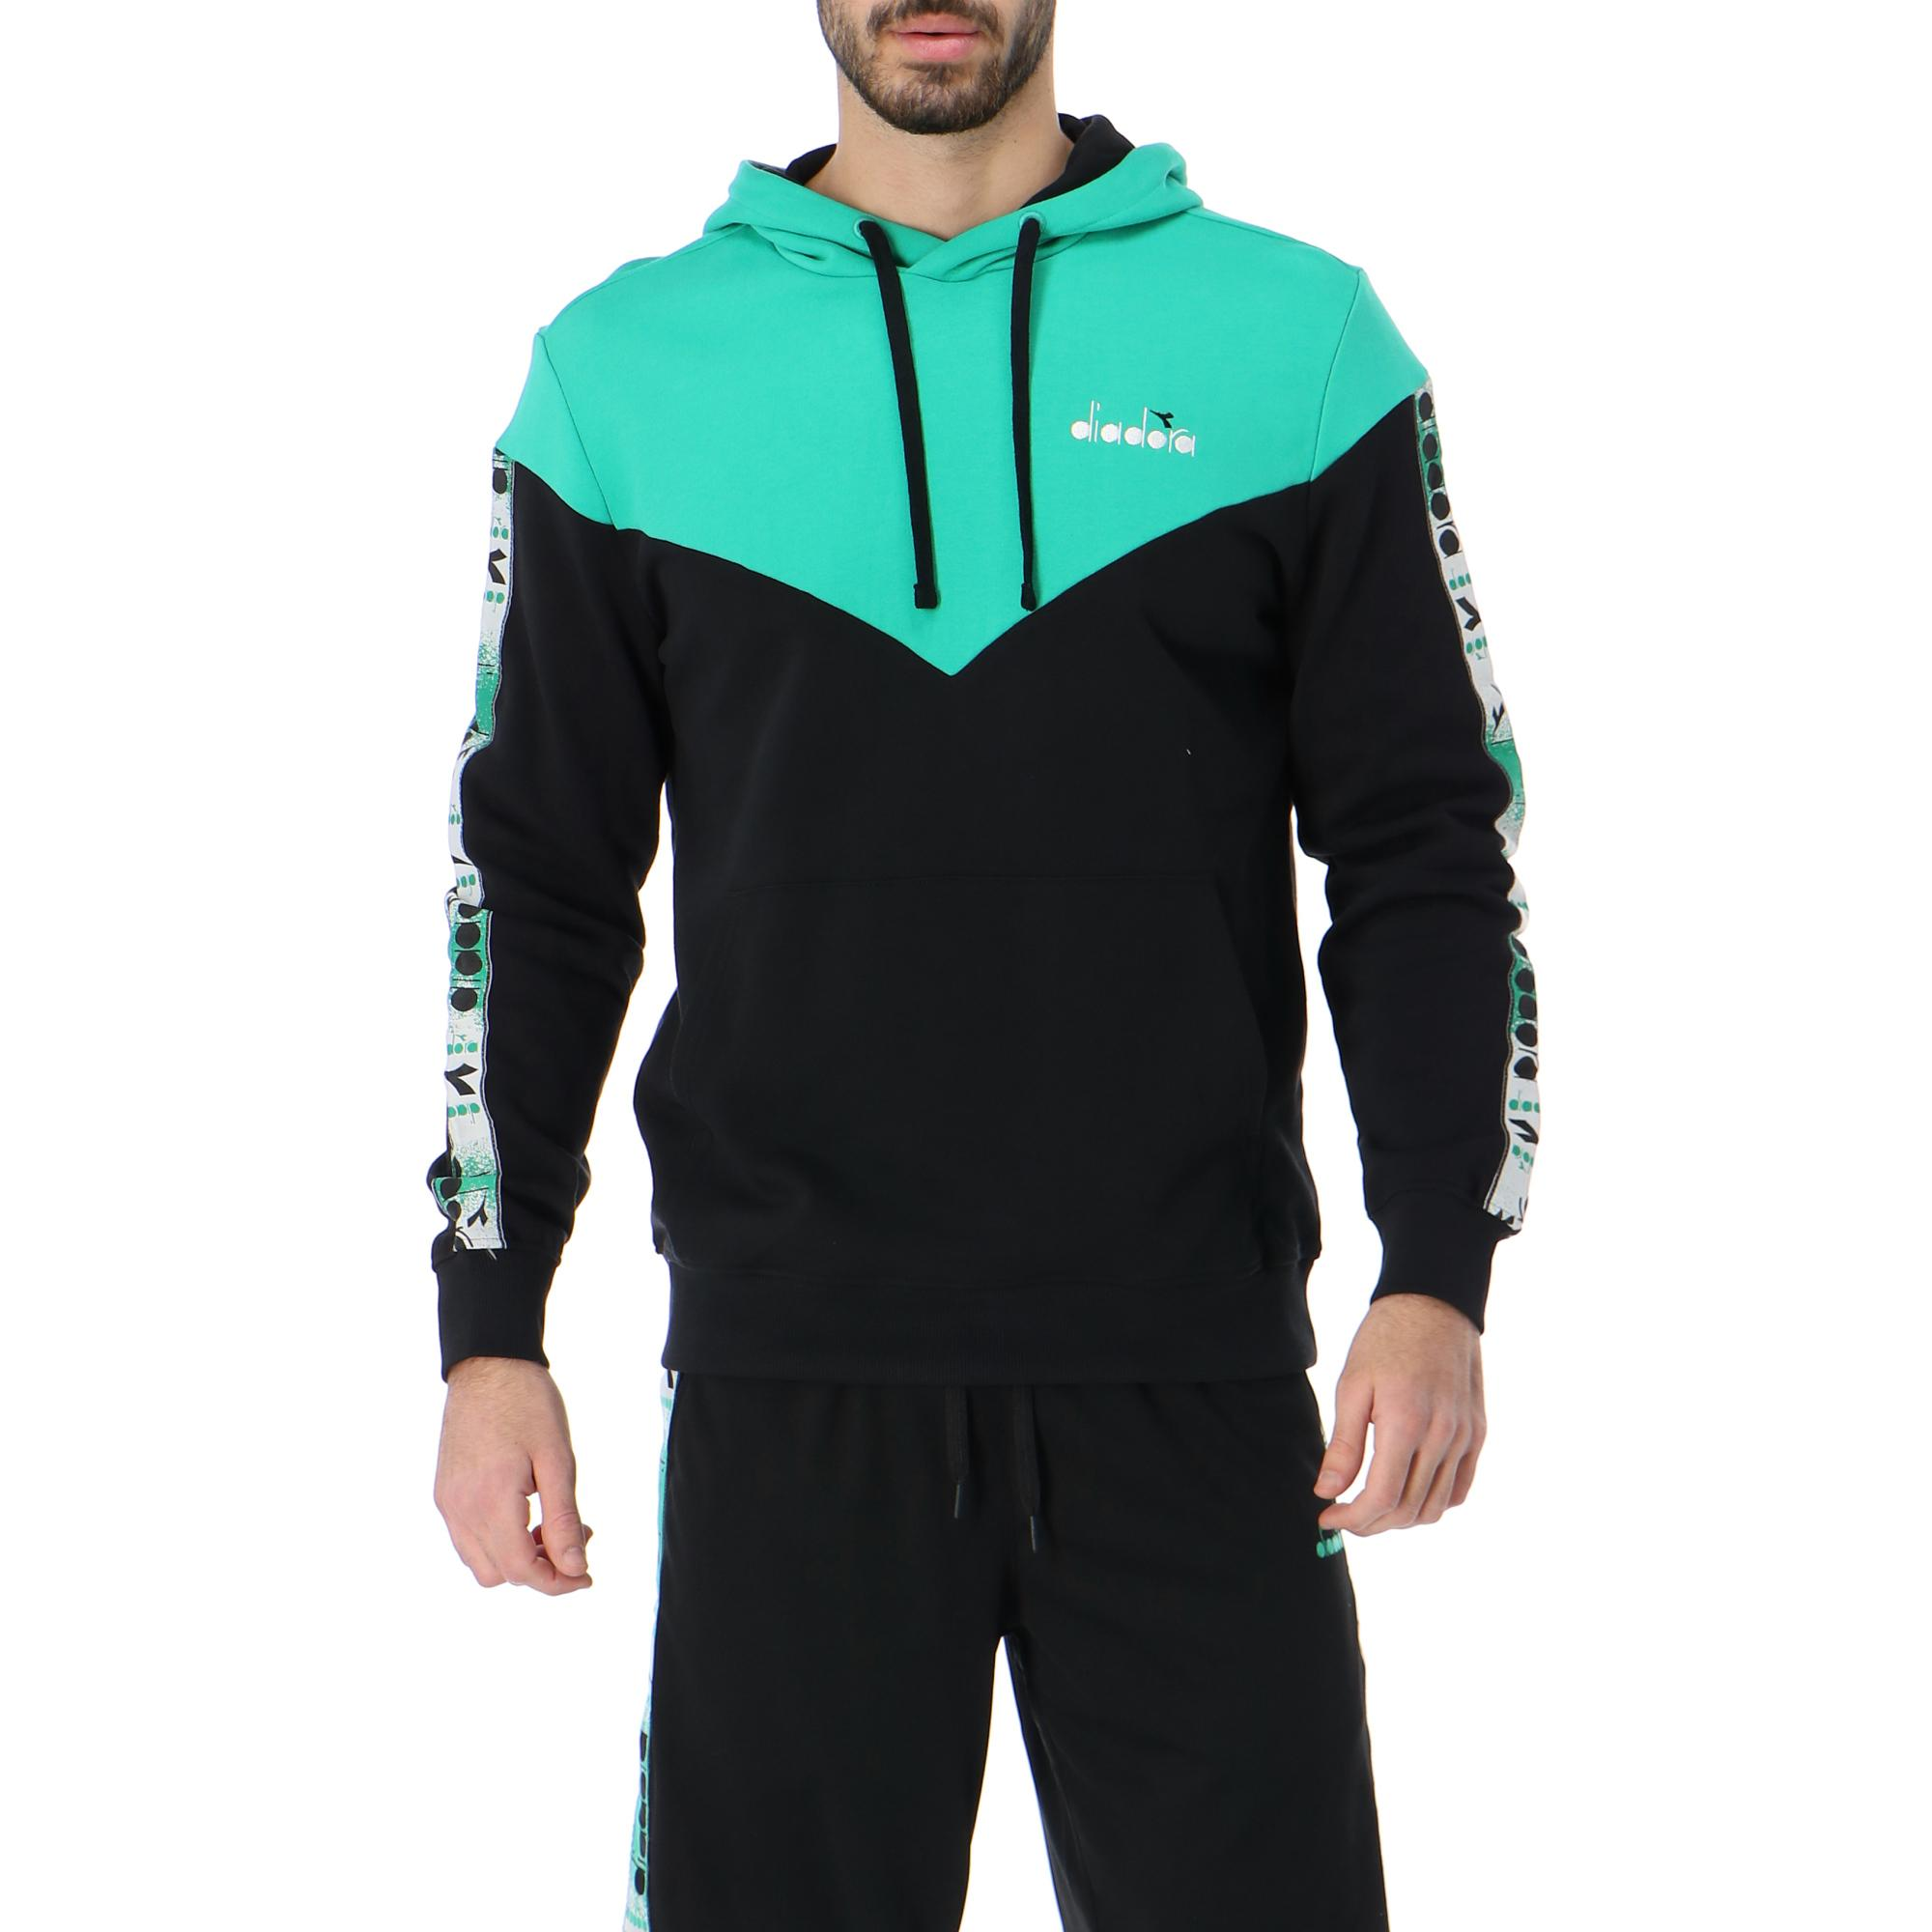 Latest Diadora Sweatshirts & Parkas for Men Cheap Price